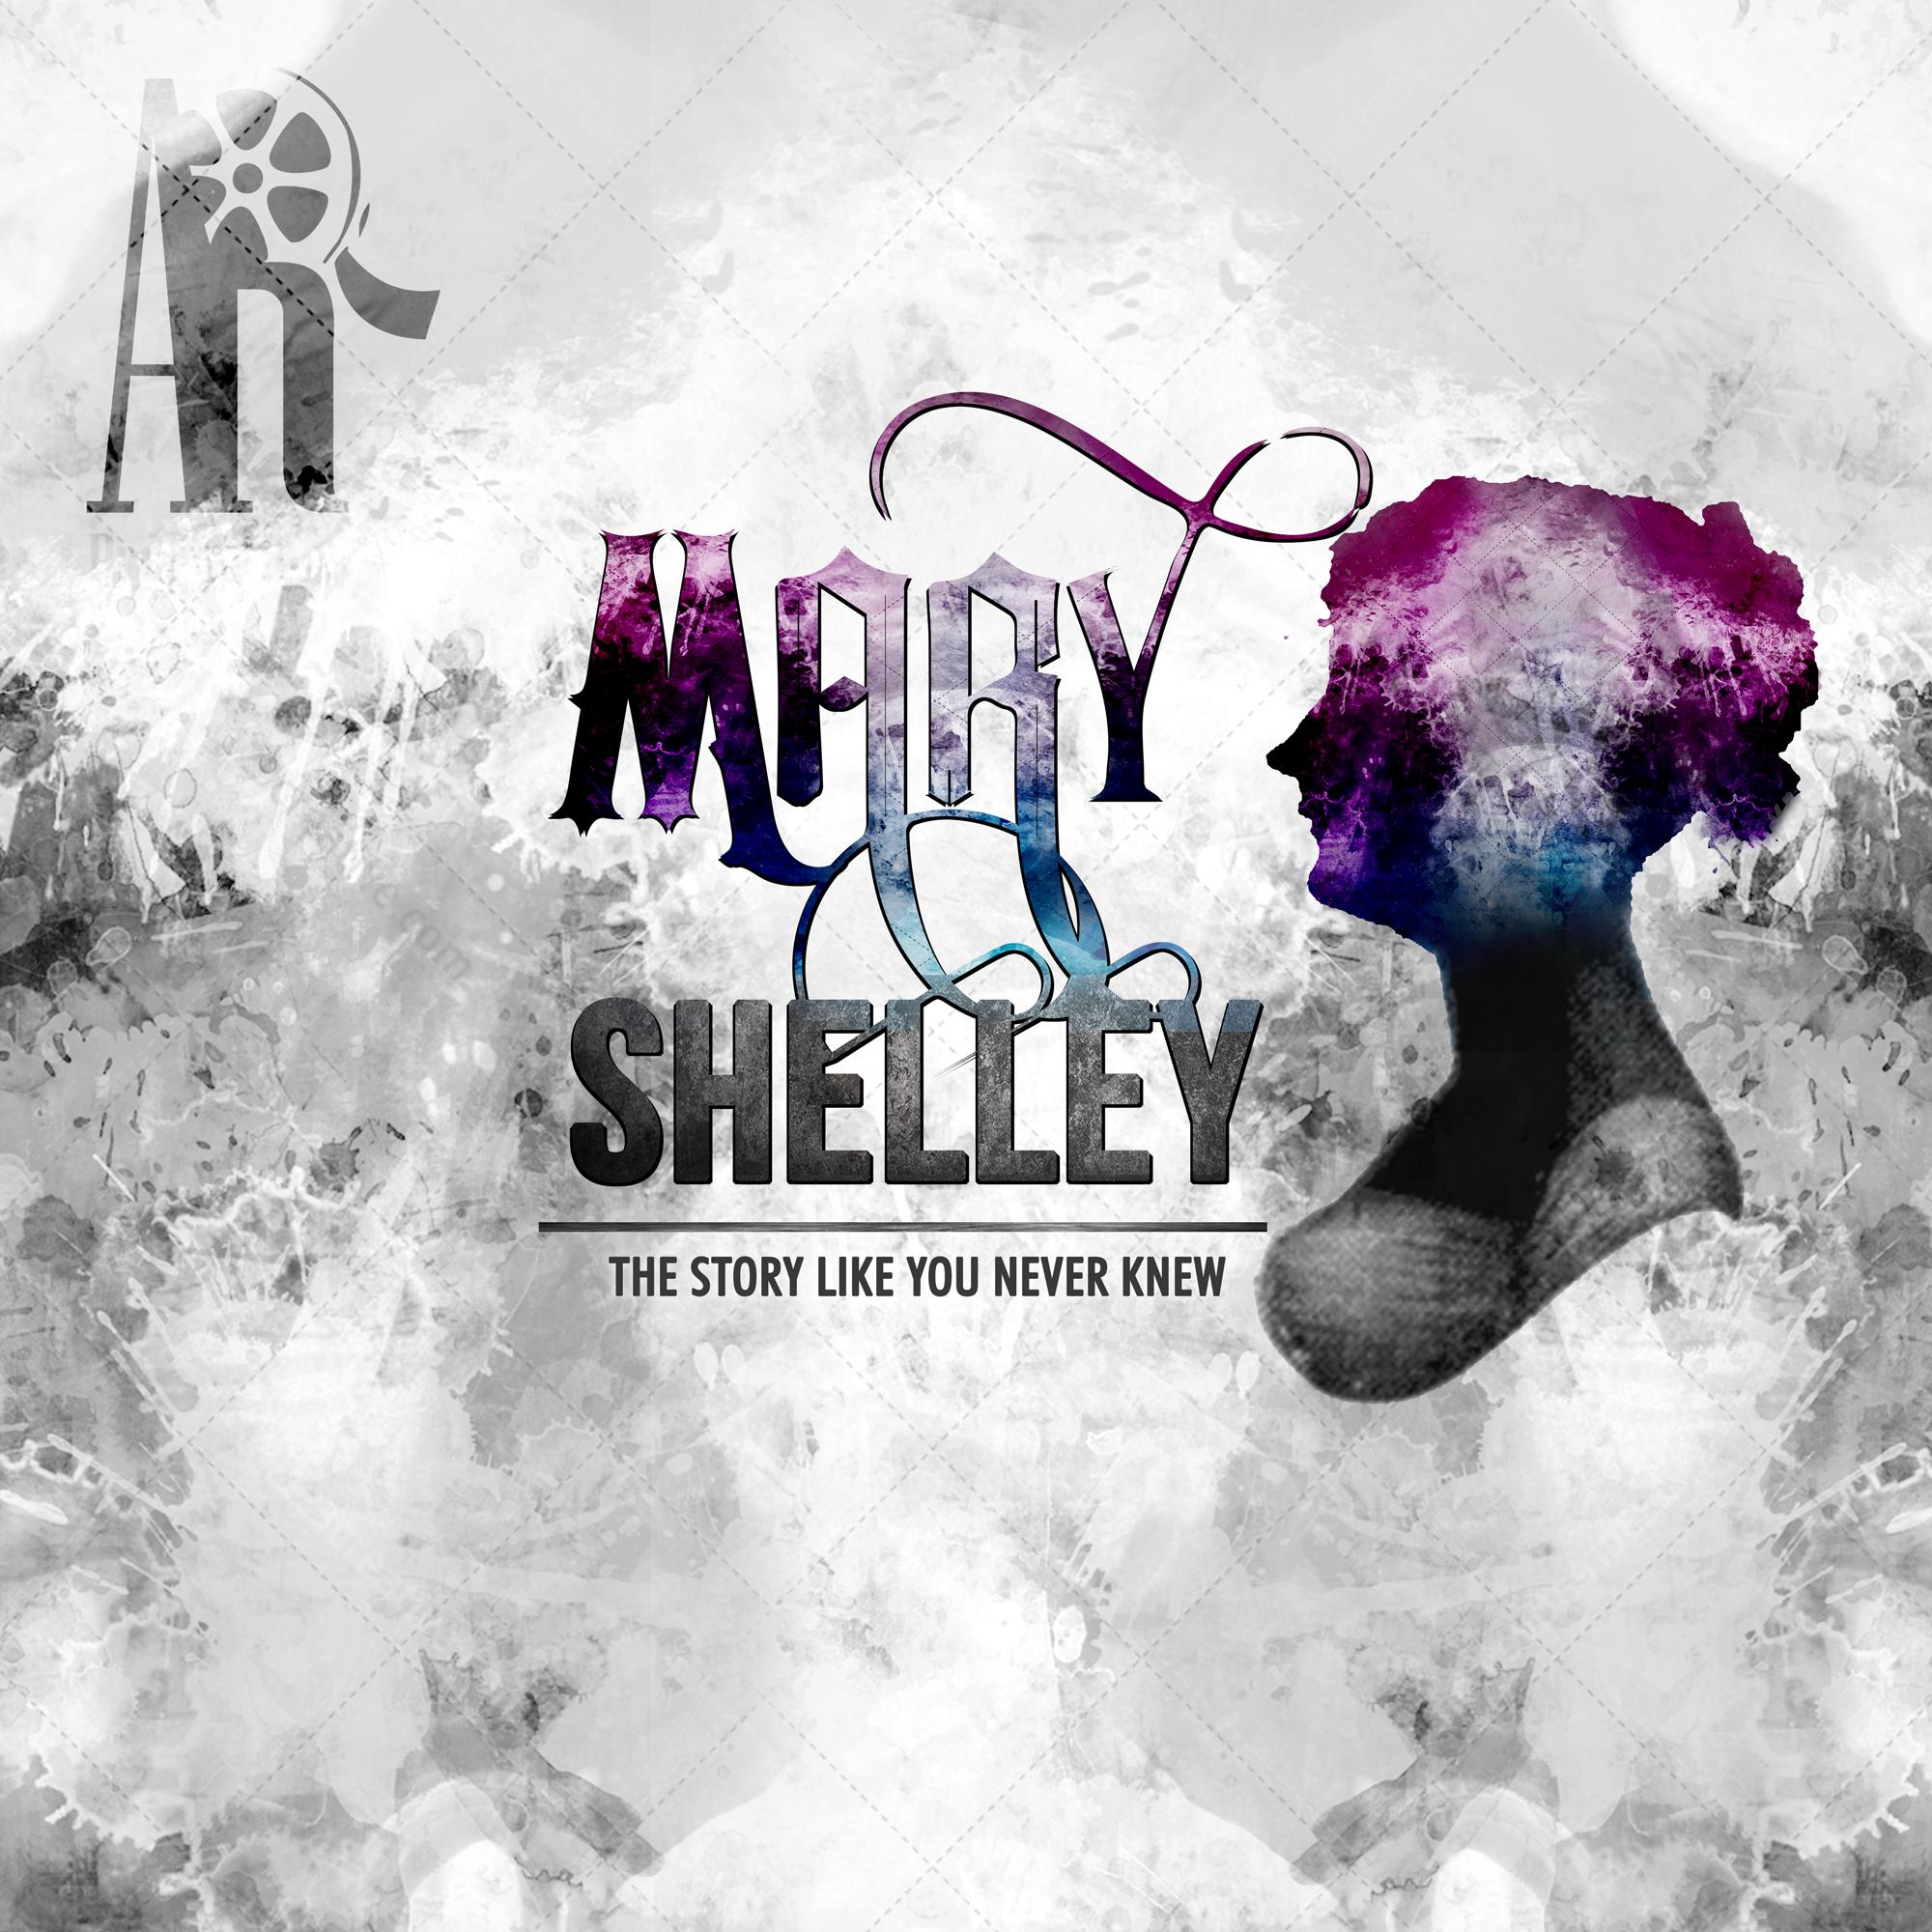 Perfil Musical Mary Shelley